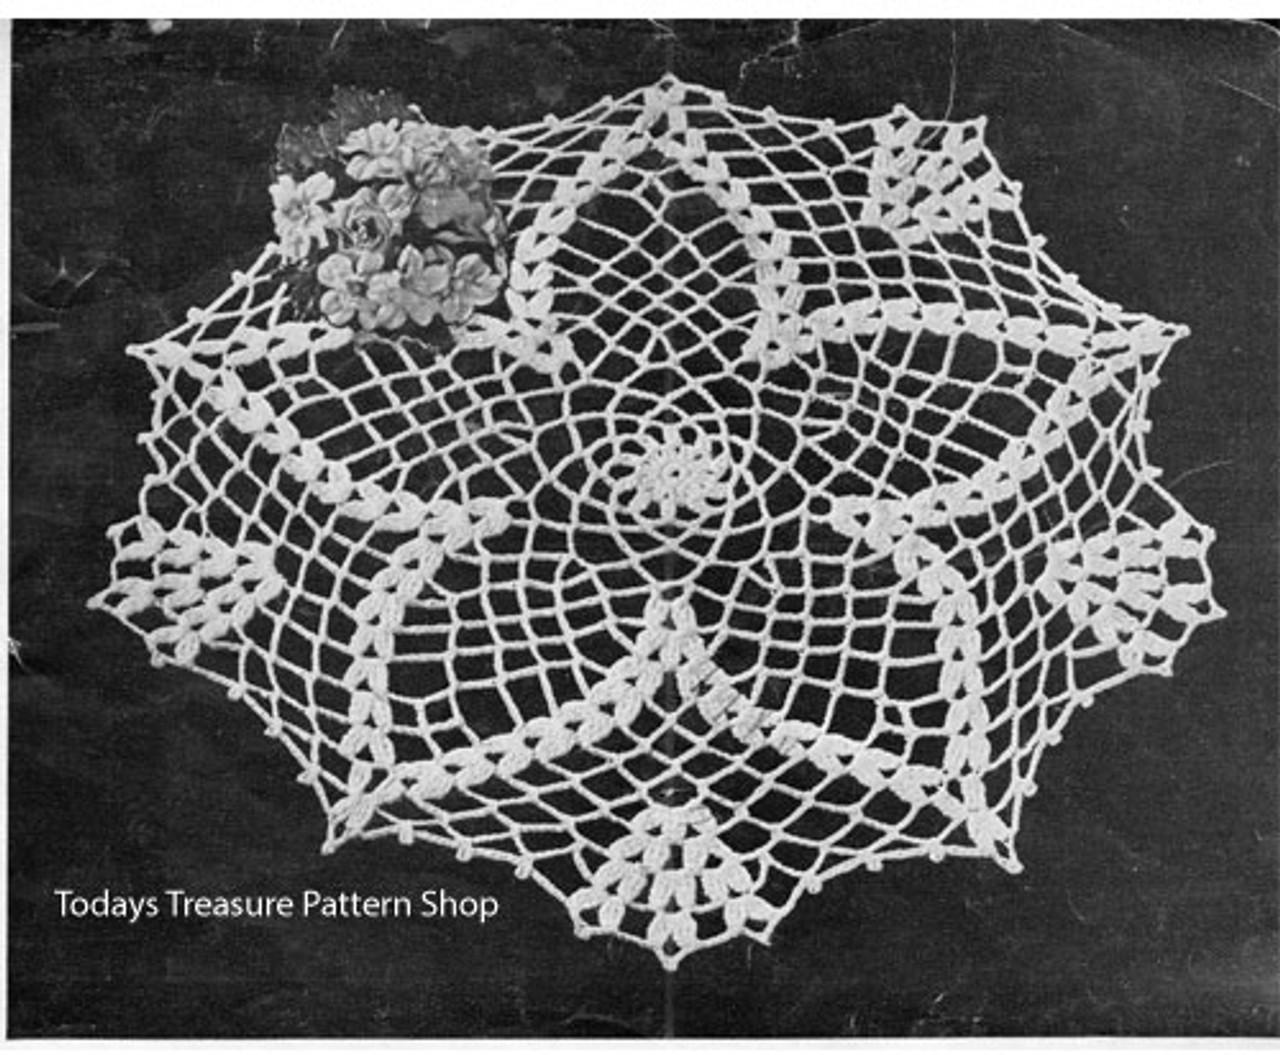 Cluster Stitch Star Crocheted Doily Pattern